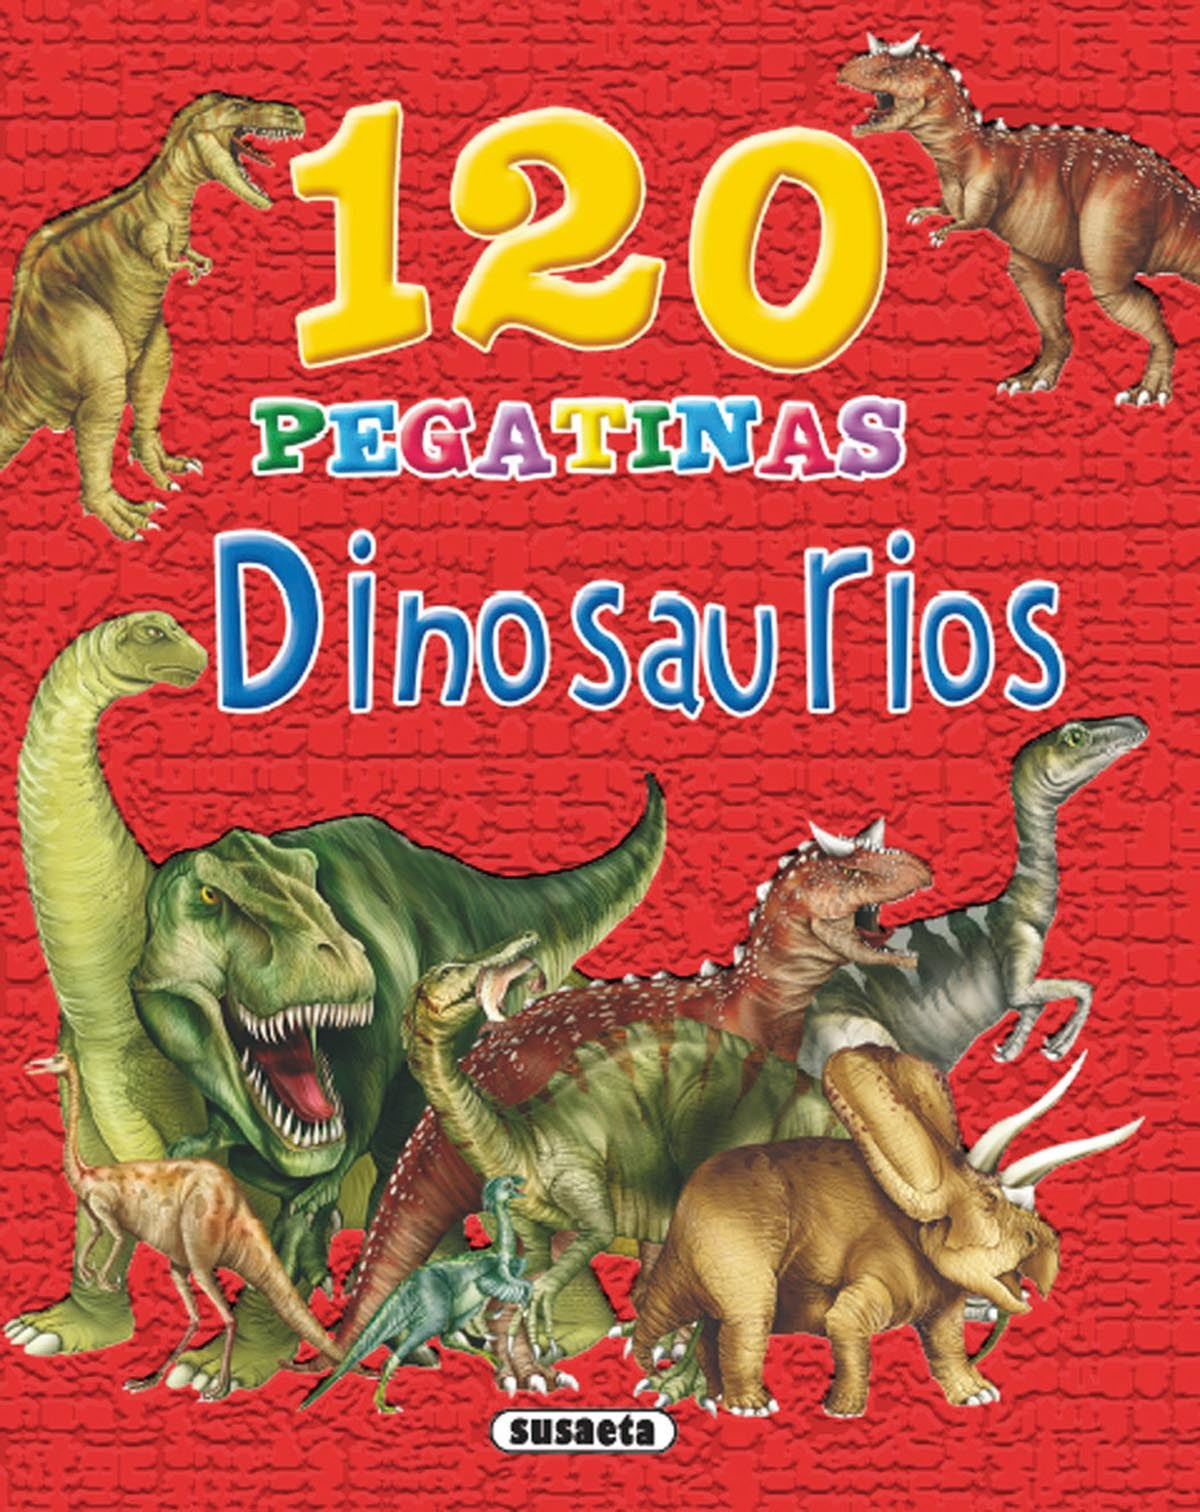 120 pegatinas de dinosaurios 9788467727876